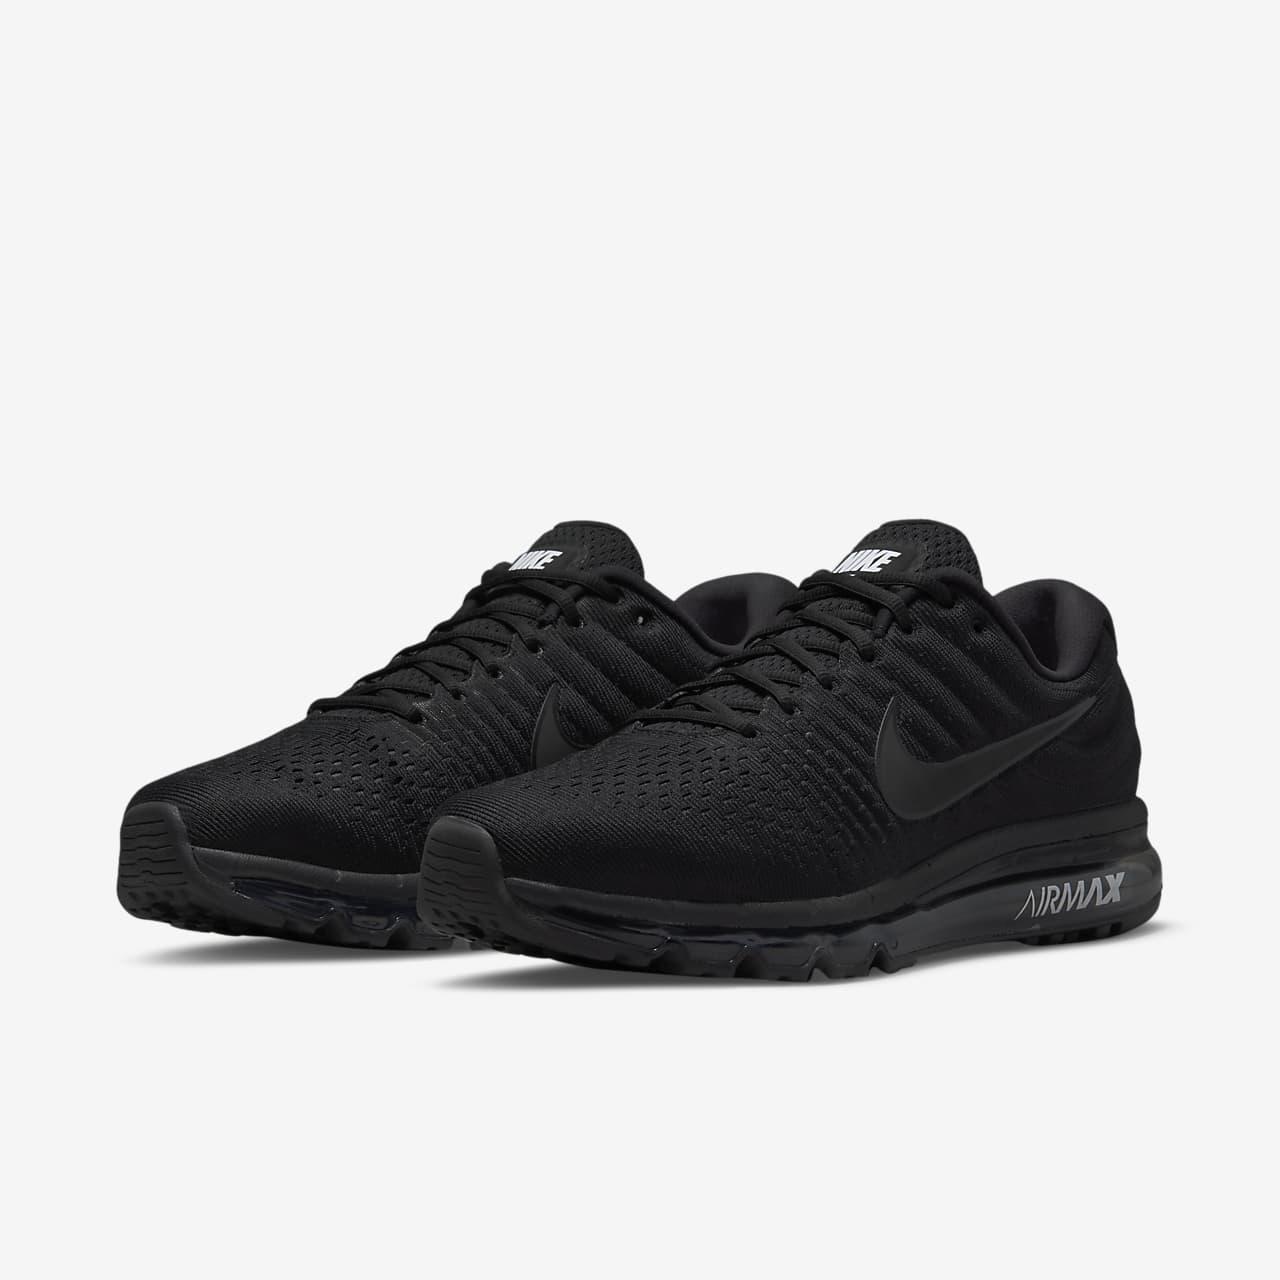 online store b44f4 0fd9b ... Sko Nike Air Max 2017 för män